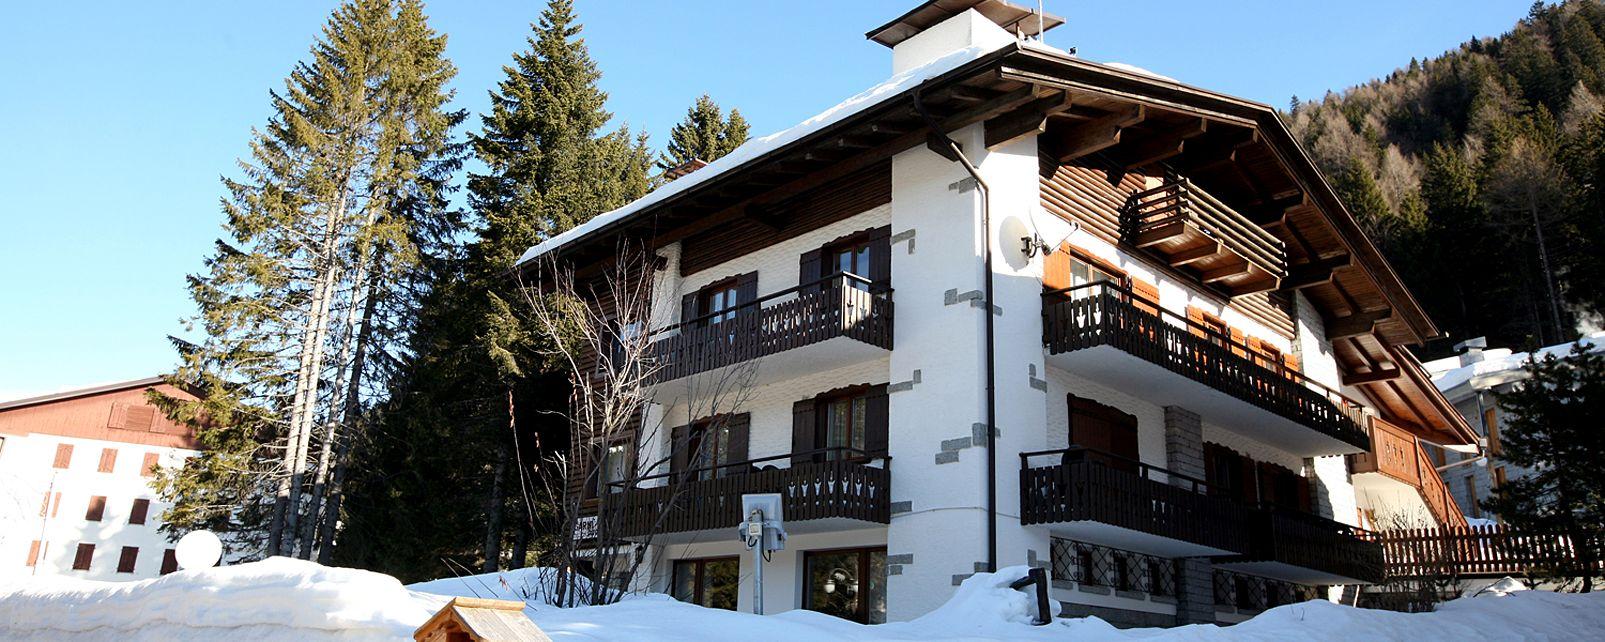 Hôtel Garnì Bucaneve